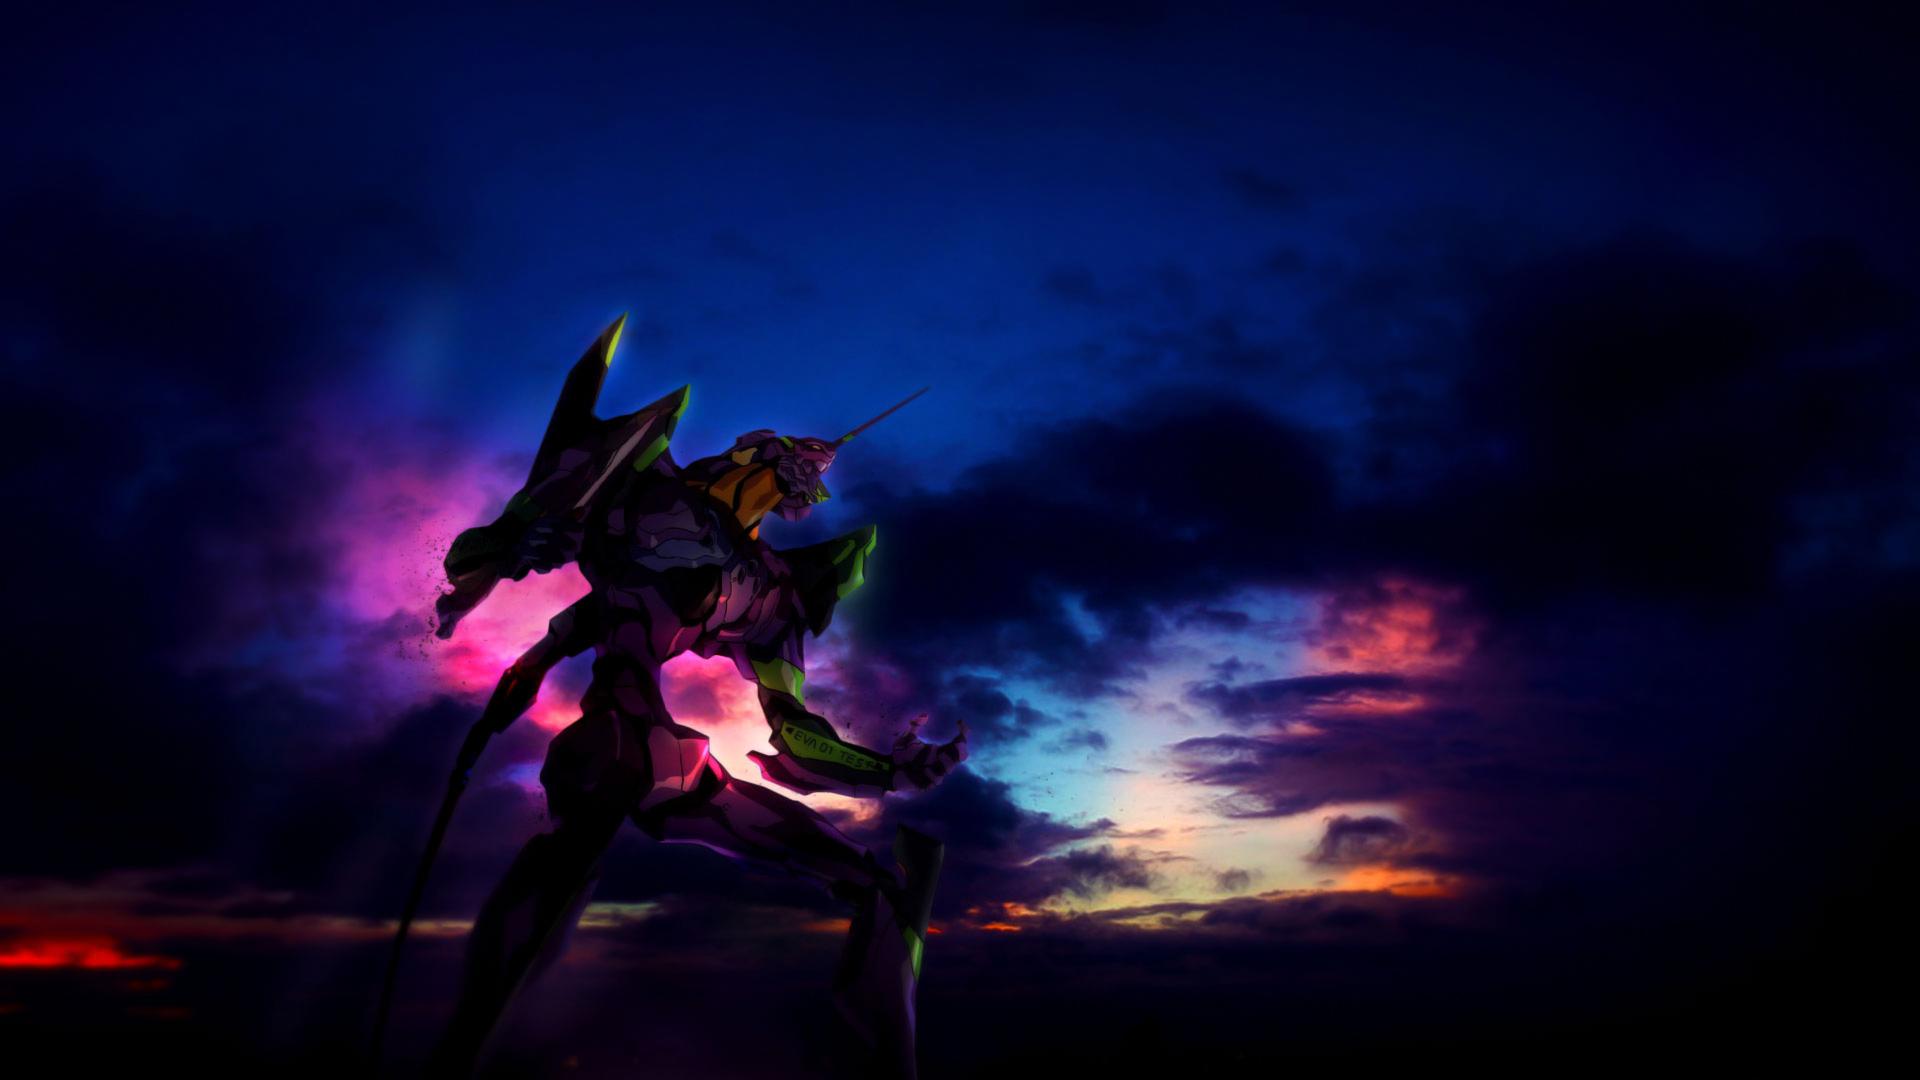 evangelion wallpaper hd anime - photo #10